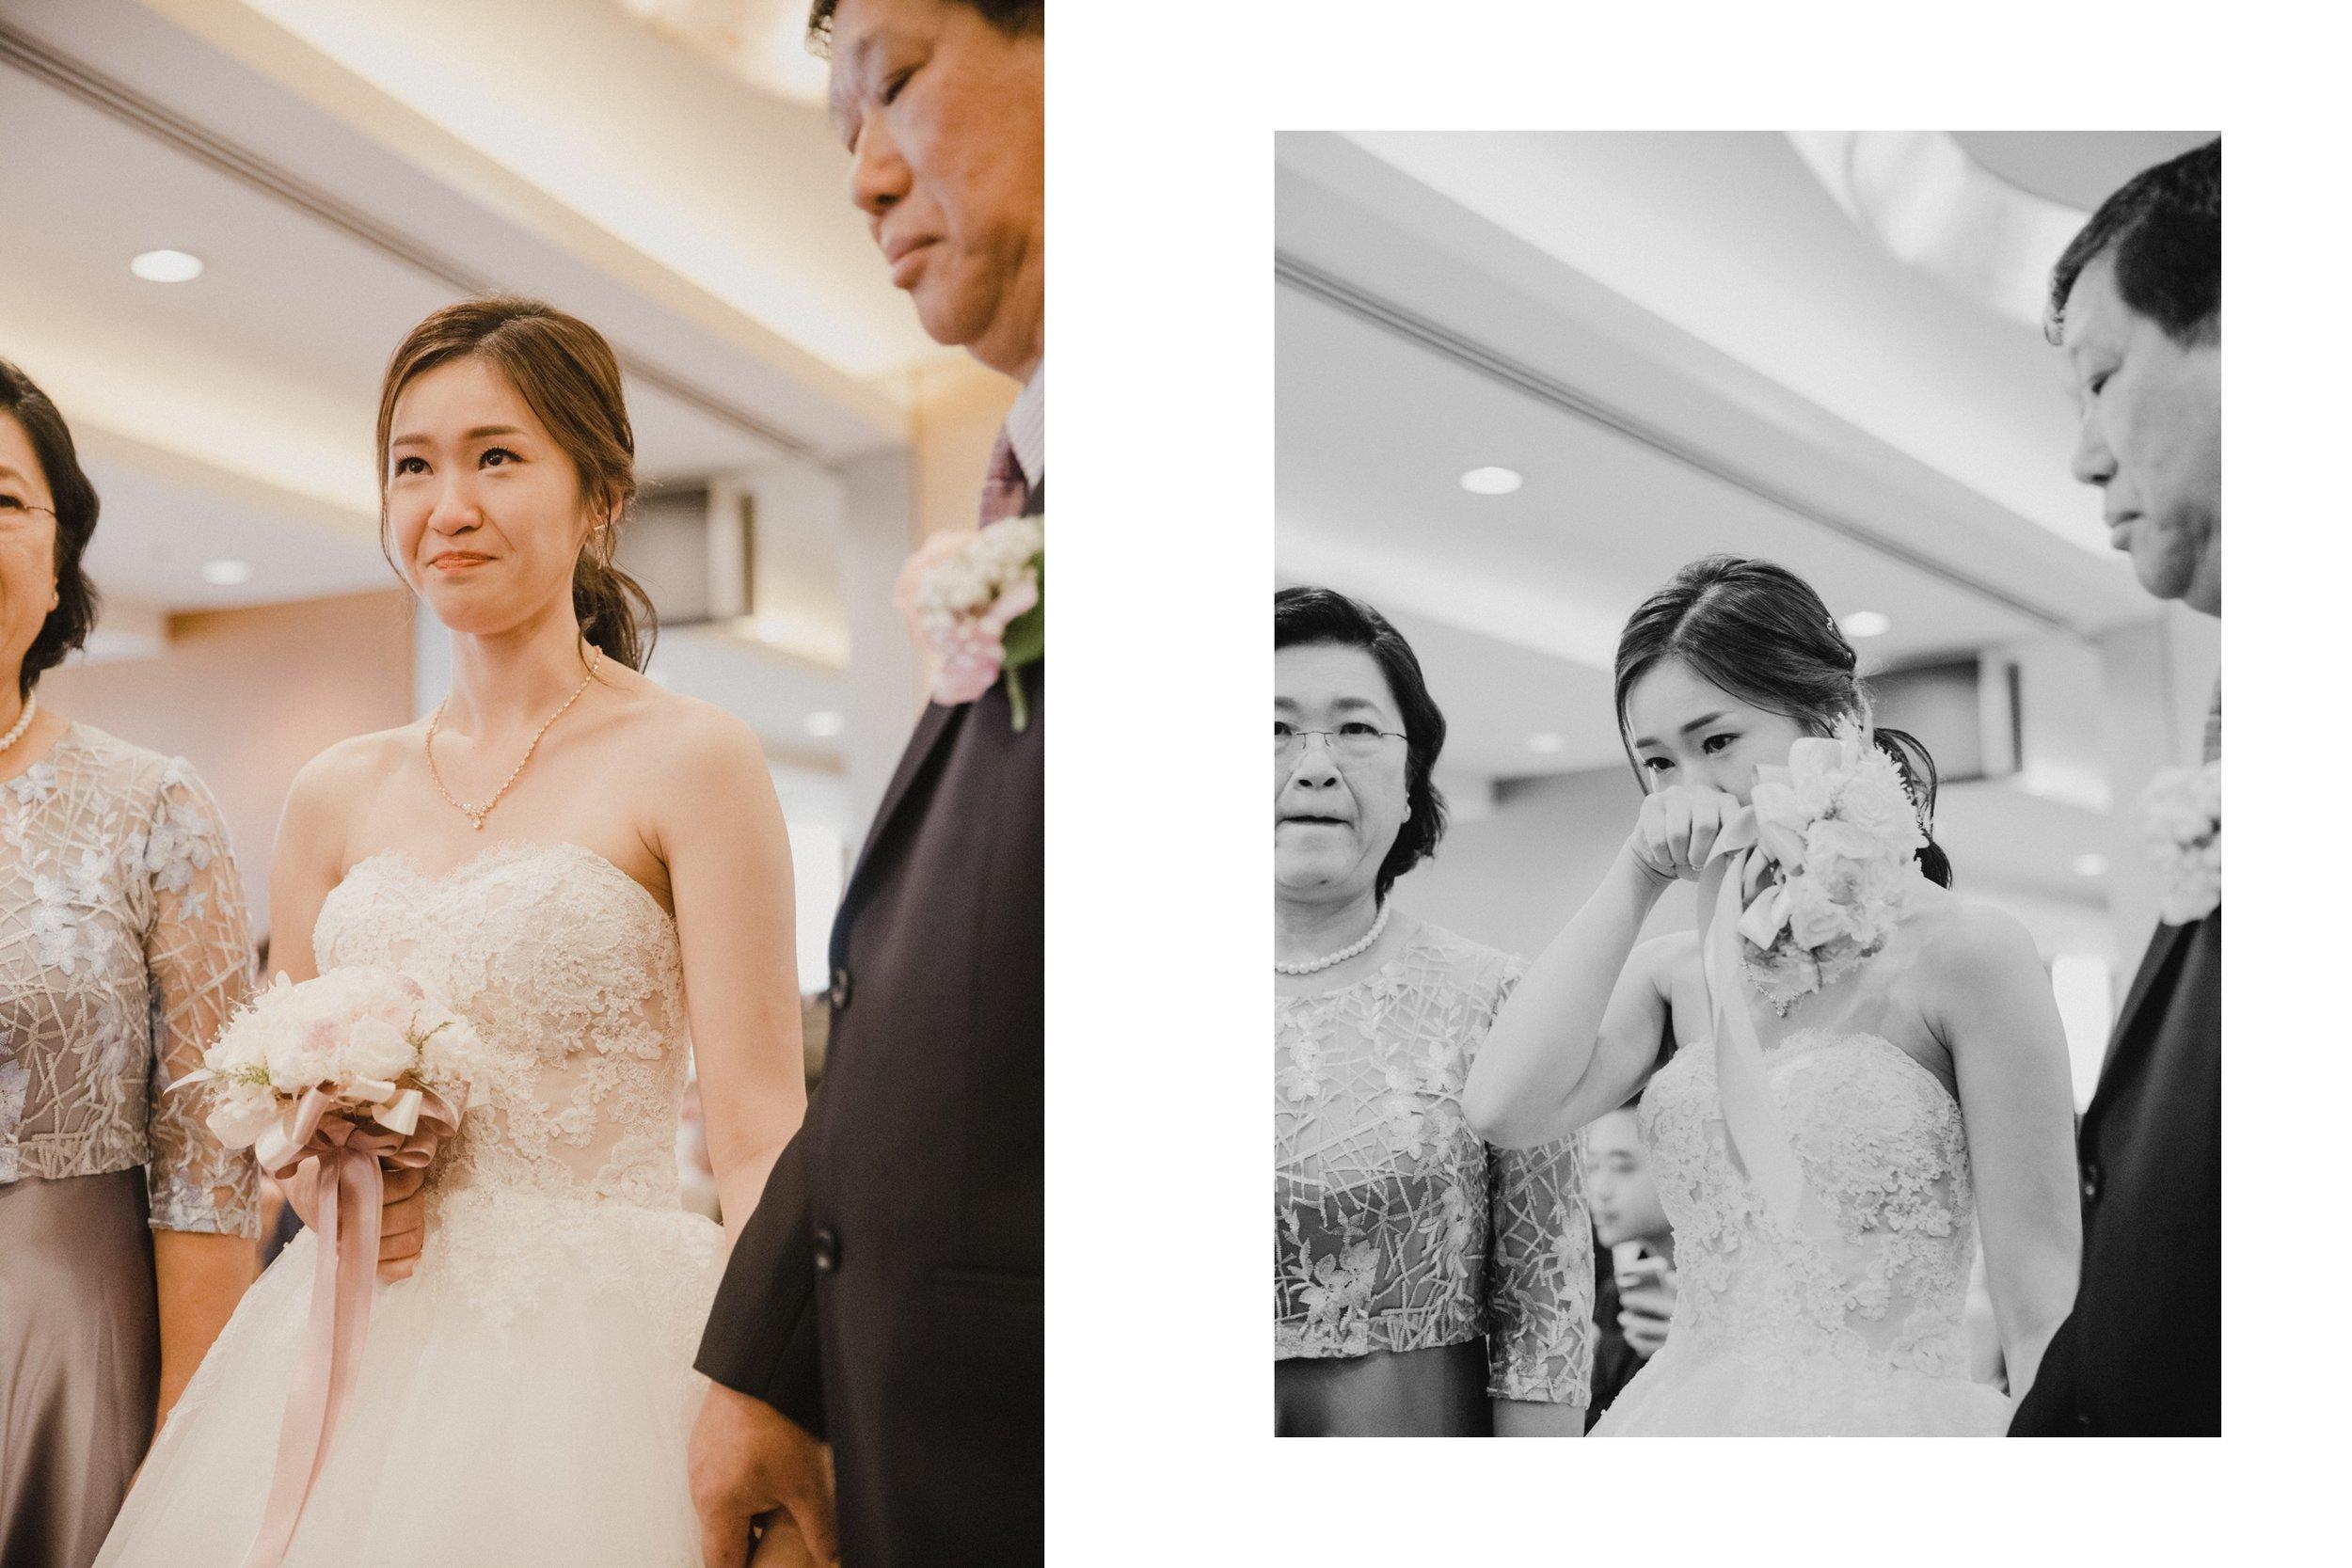 wedding-caridee-oscar-lunch-ambassador-hsinchu-結婚午宴-新竹國賓_70.jpg